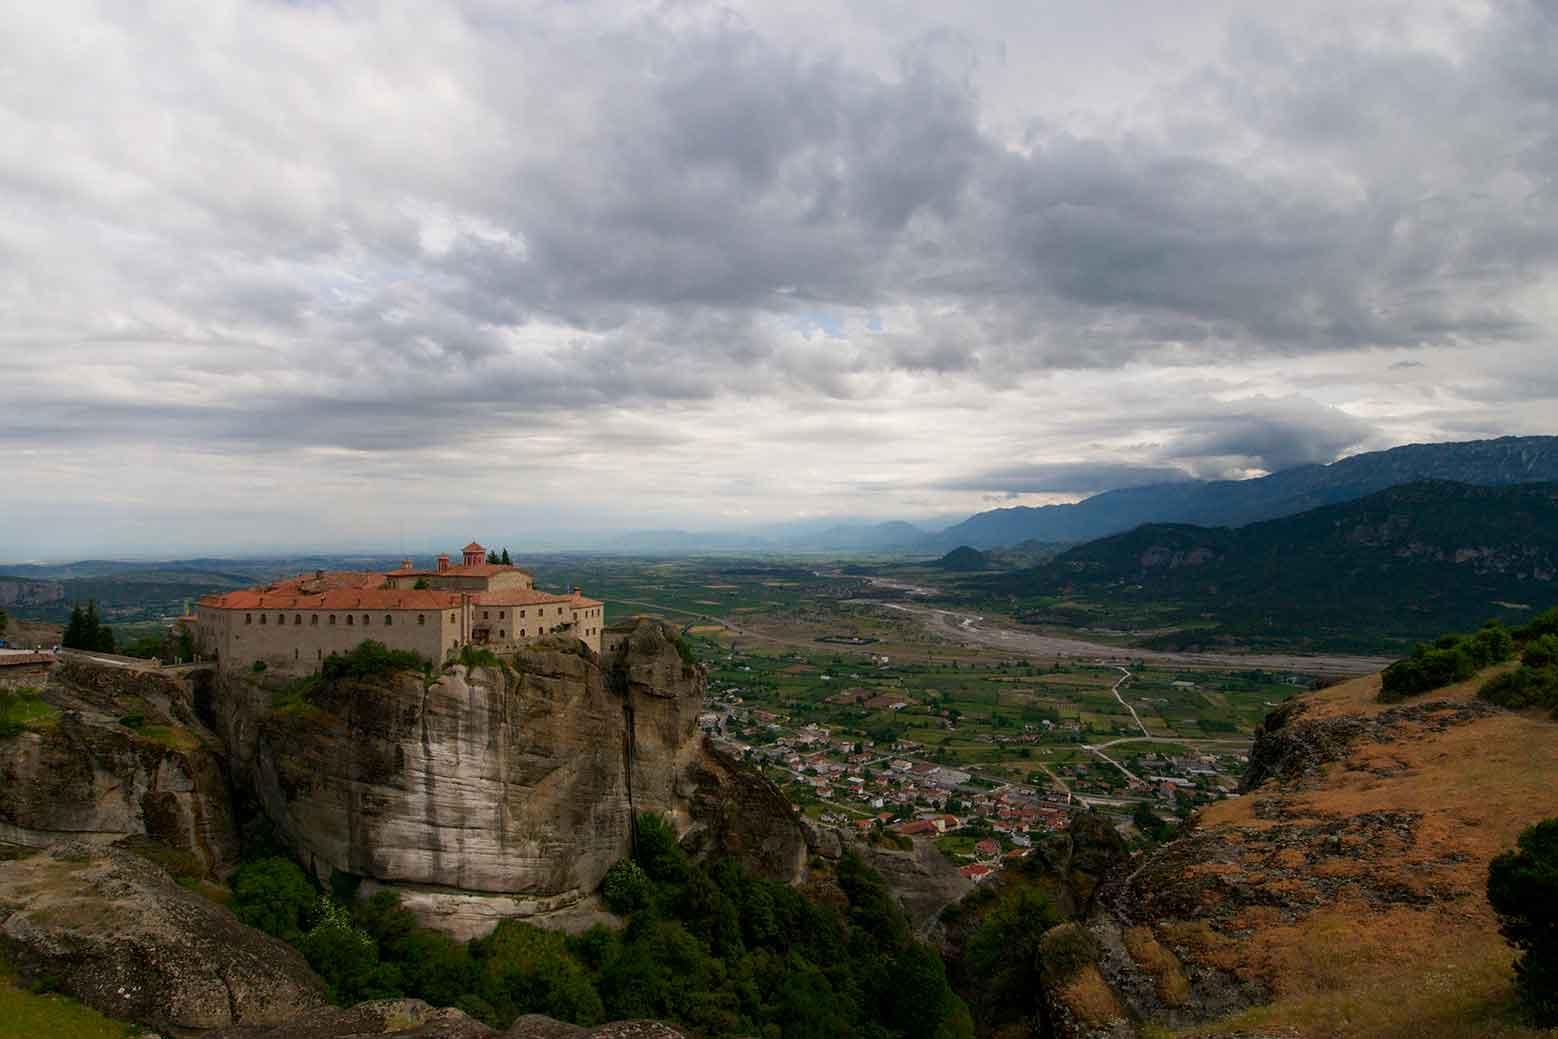 View of the Meteora Monasteries